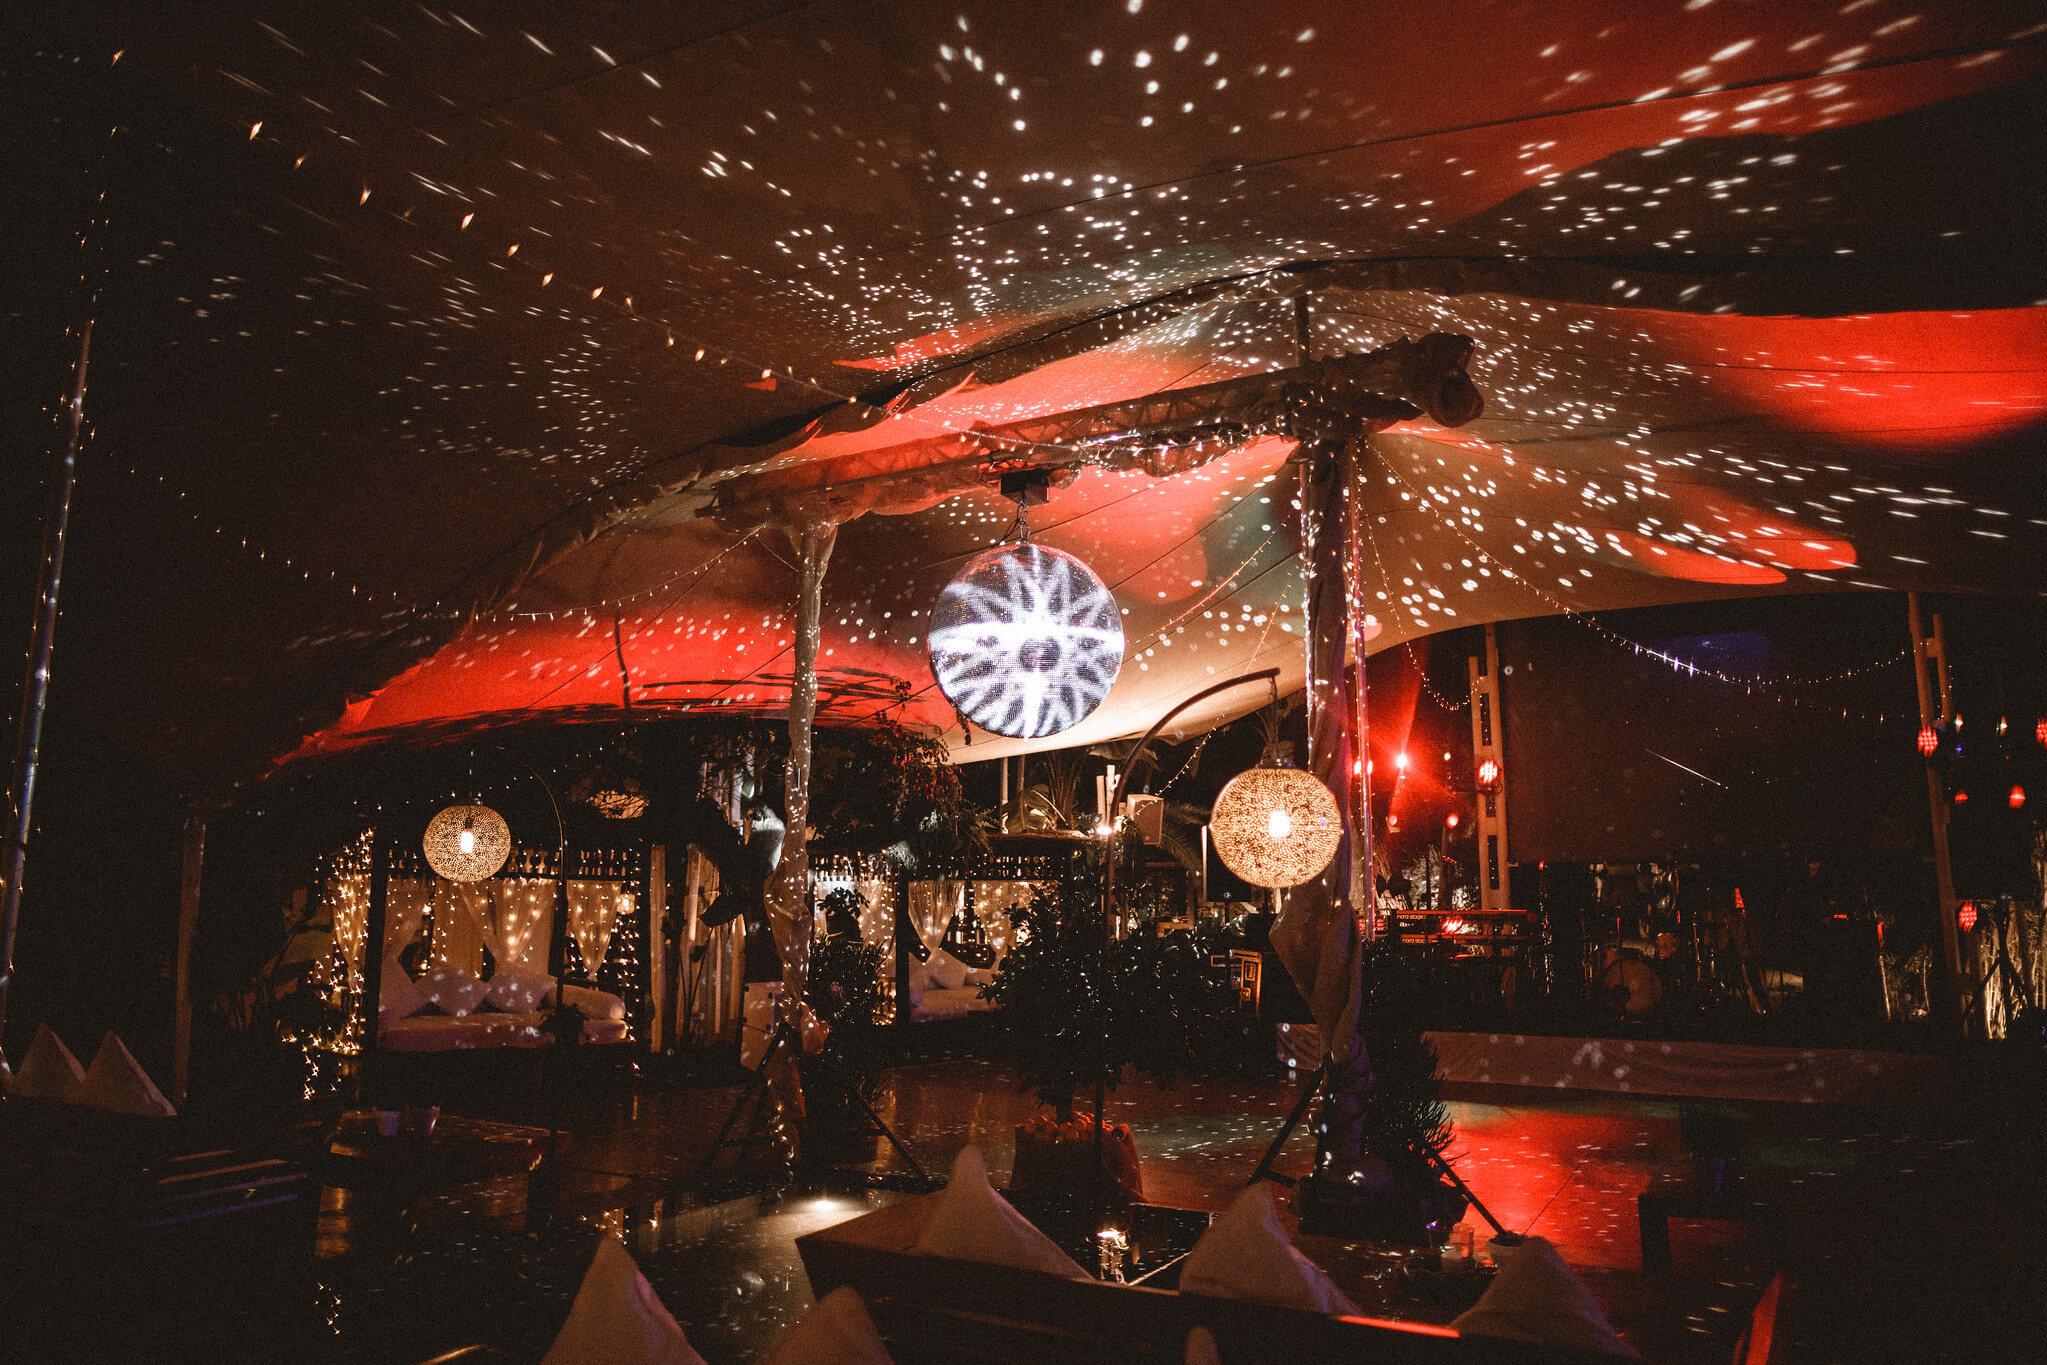 https://www.white-ibiza.com/wp-content/uploads/2020/03/white-ibiza-weddings-velvet-circus-ibiza-2020-10.jpeg